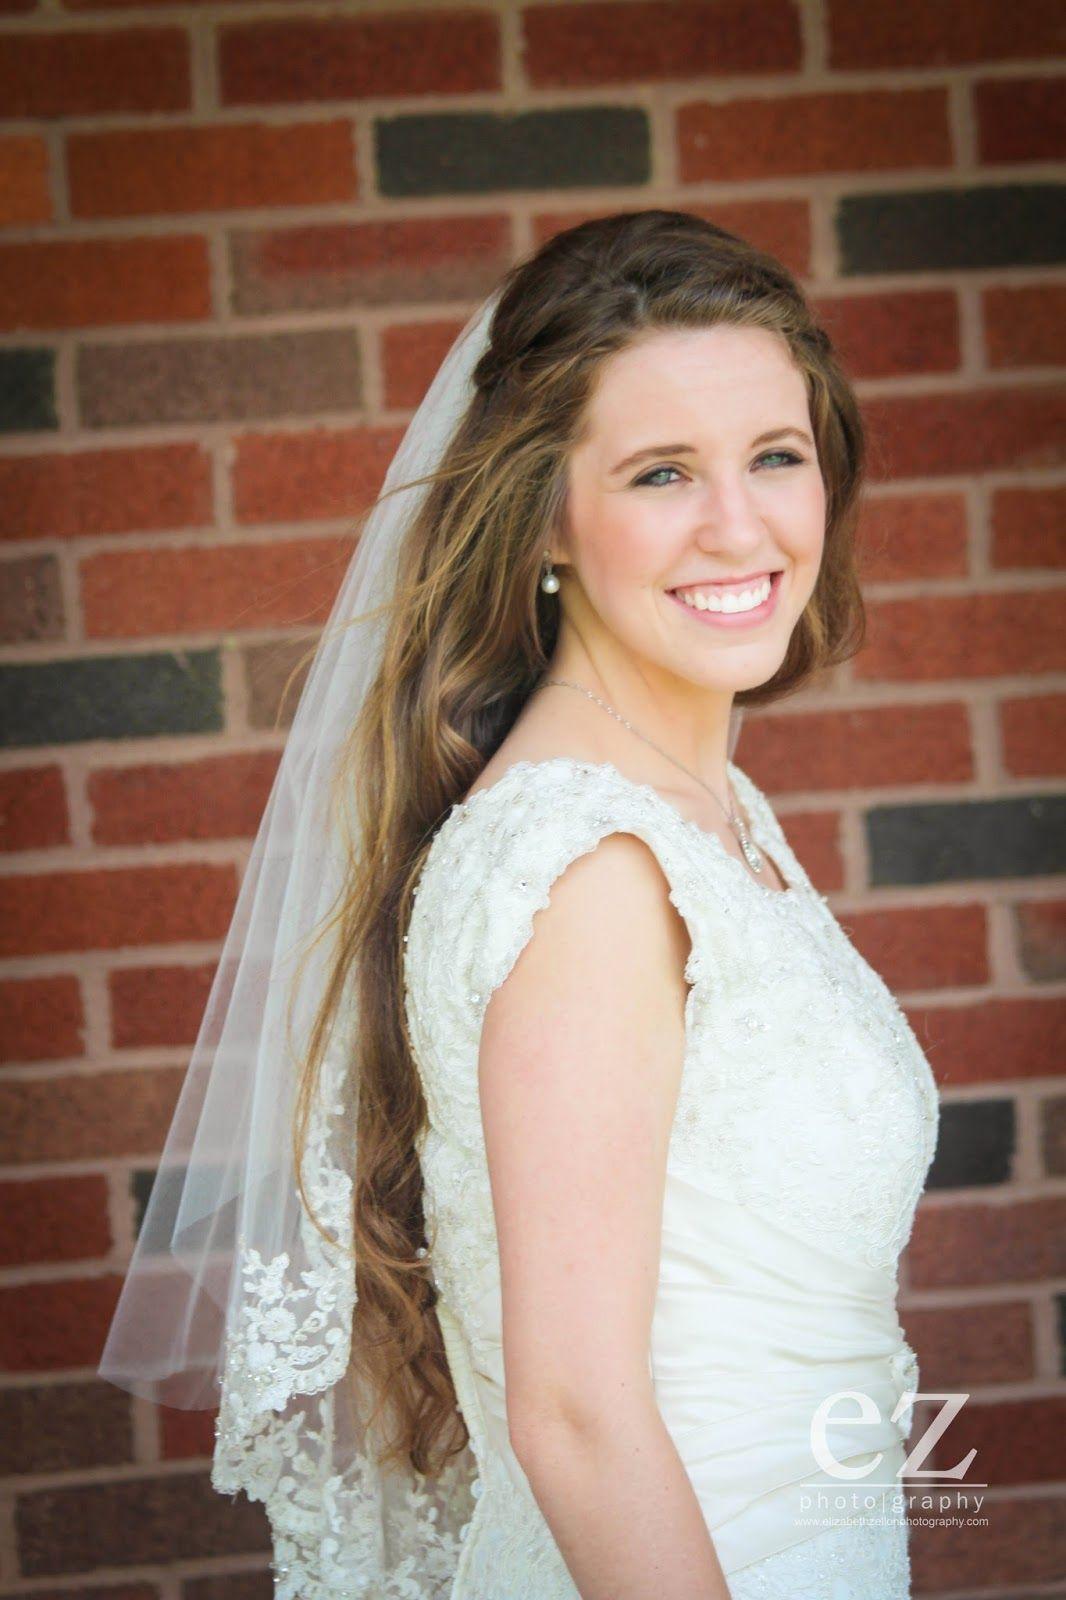 Jill Duggar And Derrick Dillard Wedding Site - Jill makes a beautiful bride